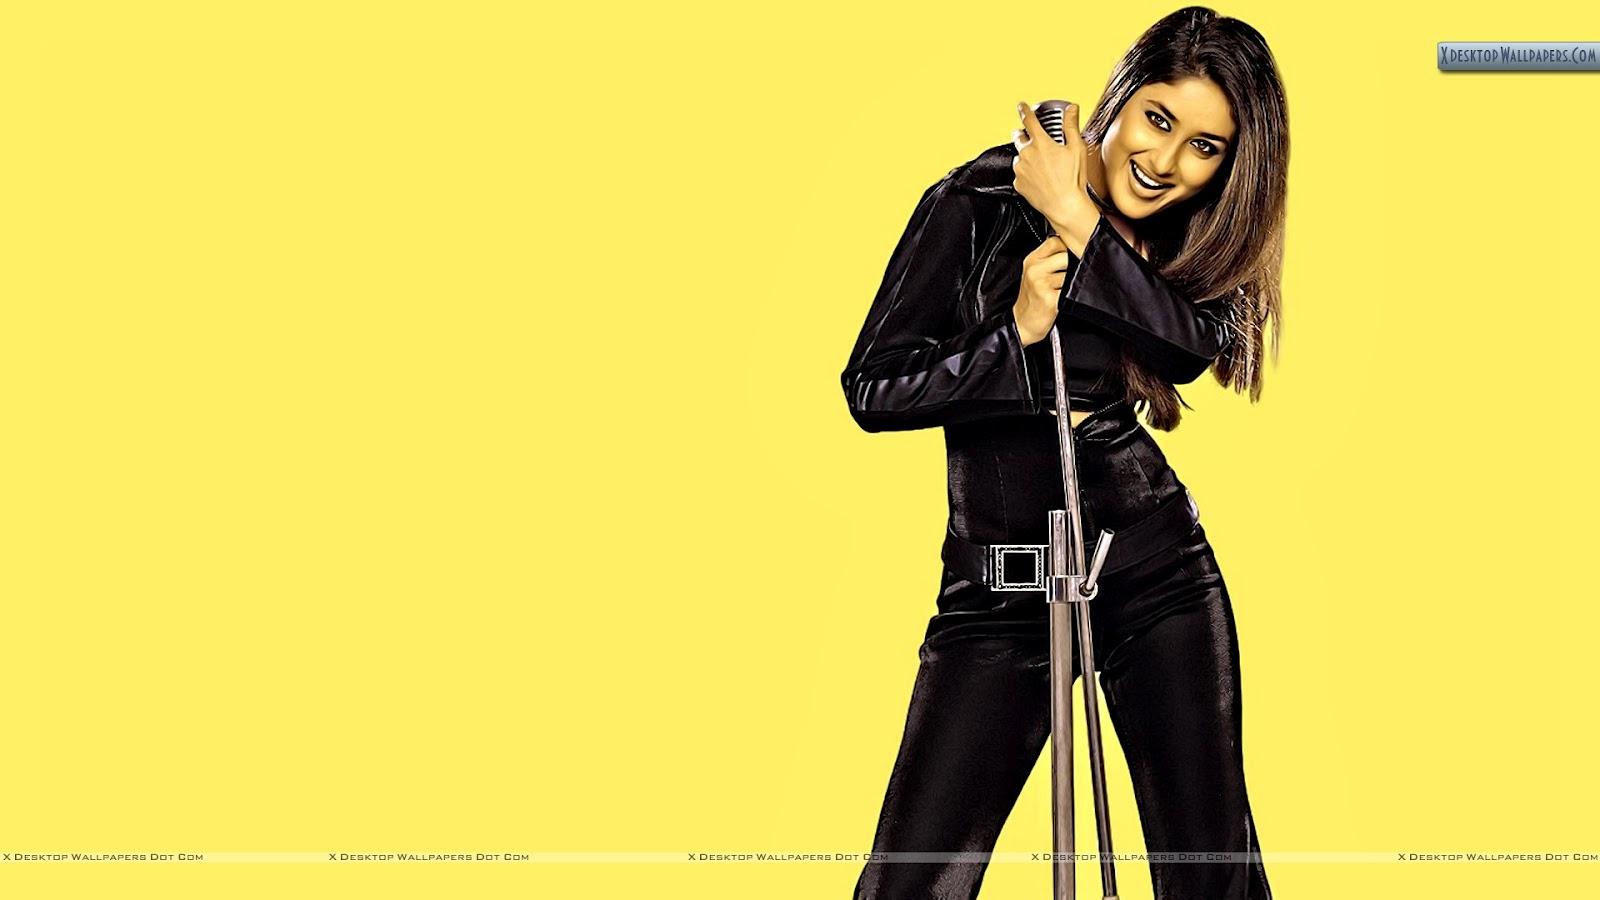 http://3.bp.blogspot.com/-ukPztOzuamY/UAeK3X3vnII/AAAAAAAAATs/vXvlpZfBtZc/s1600/Sexy-Kareena-Kapoor-With-Mic.jpg